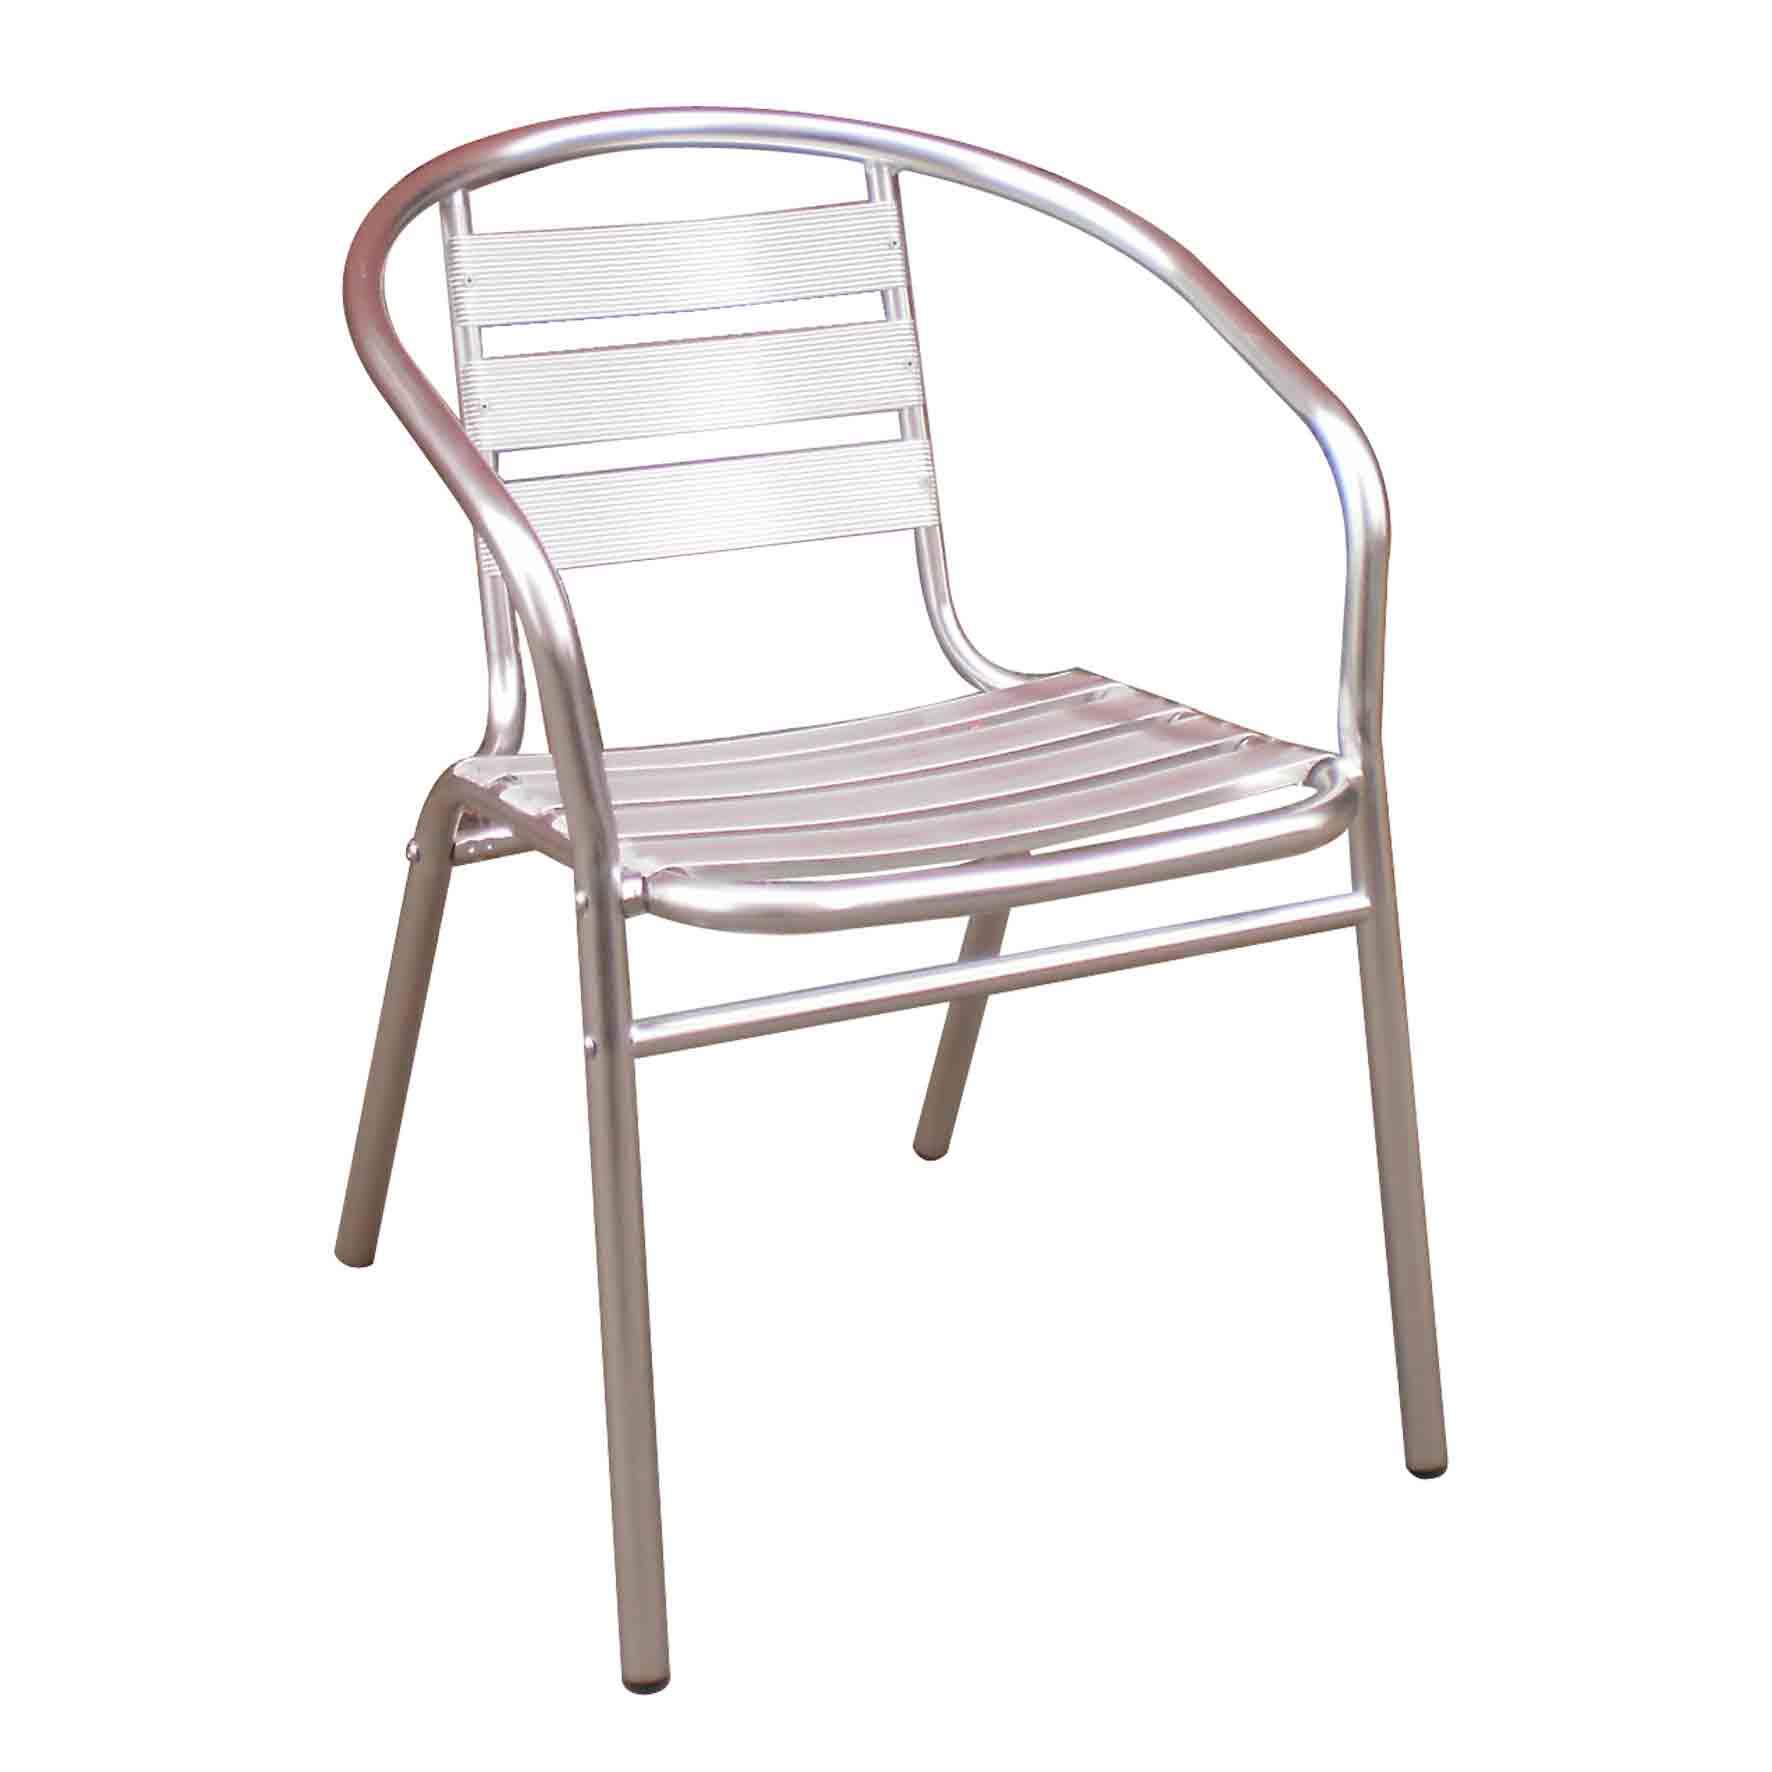 China Cheap price Cast Aluminum Table Set - JJ6101C Aluminum slats shinny stacking outdoor garden patio Chair – Jin-jiang Industry